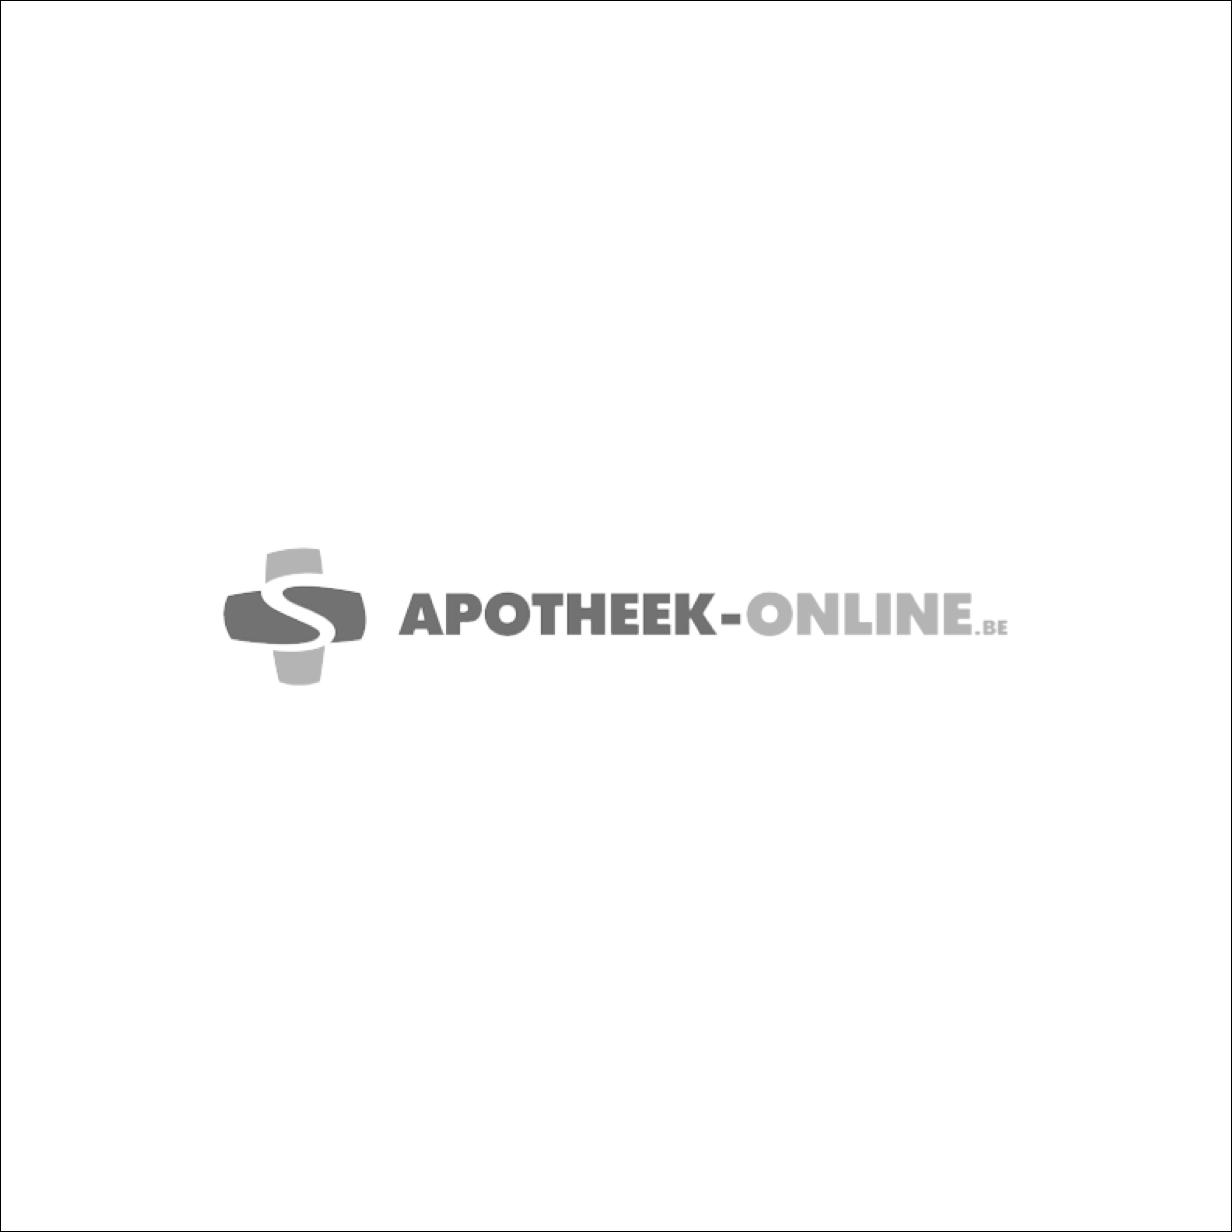 Trisportpharma Creabol Tropical Pdr 1kg